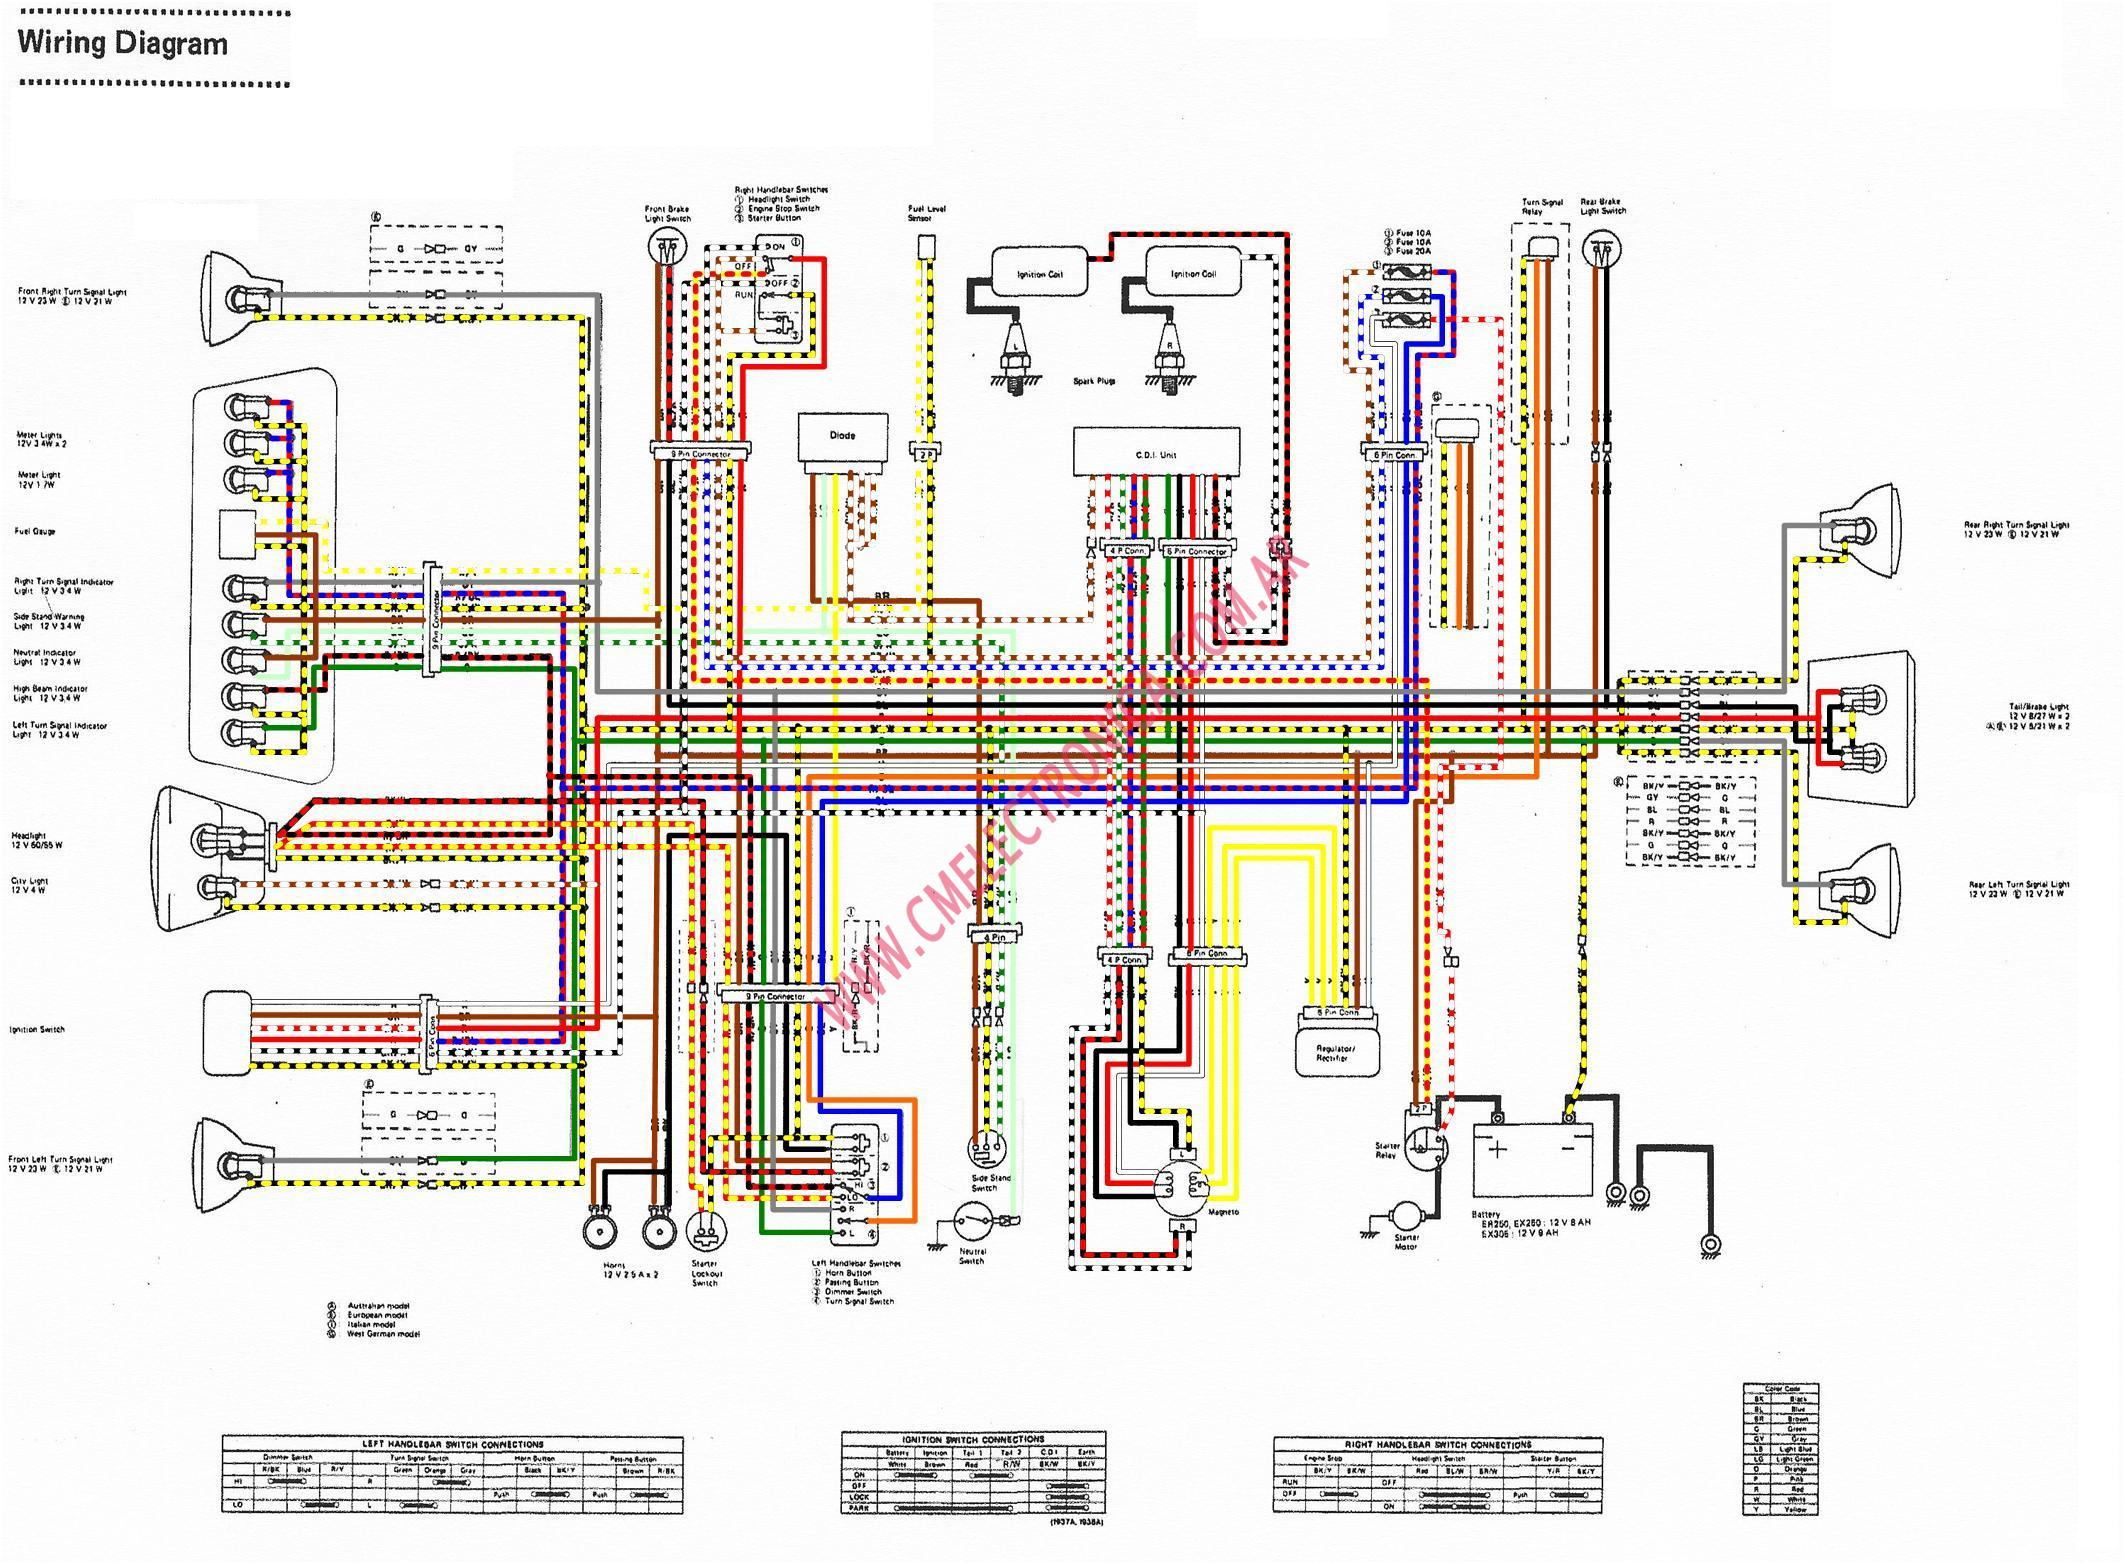 lt_1192] ninja 500 wire diagram free image about wiring diagram and schematic  schematic wiring  coun penghe ilari gresi chro carn ospor garna grebs unho rele  mohammedshrine librar wiring 101